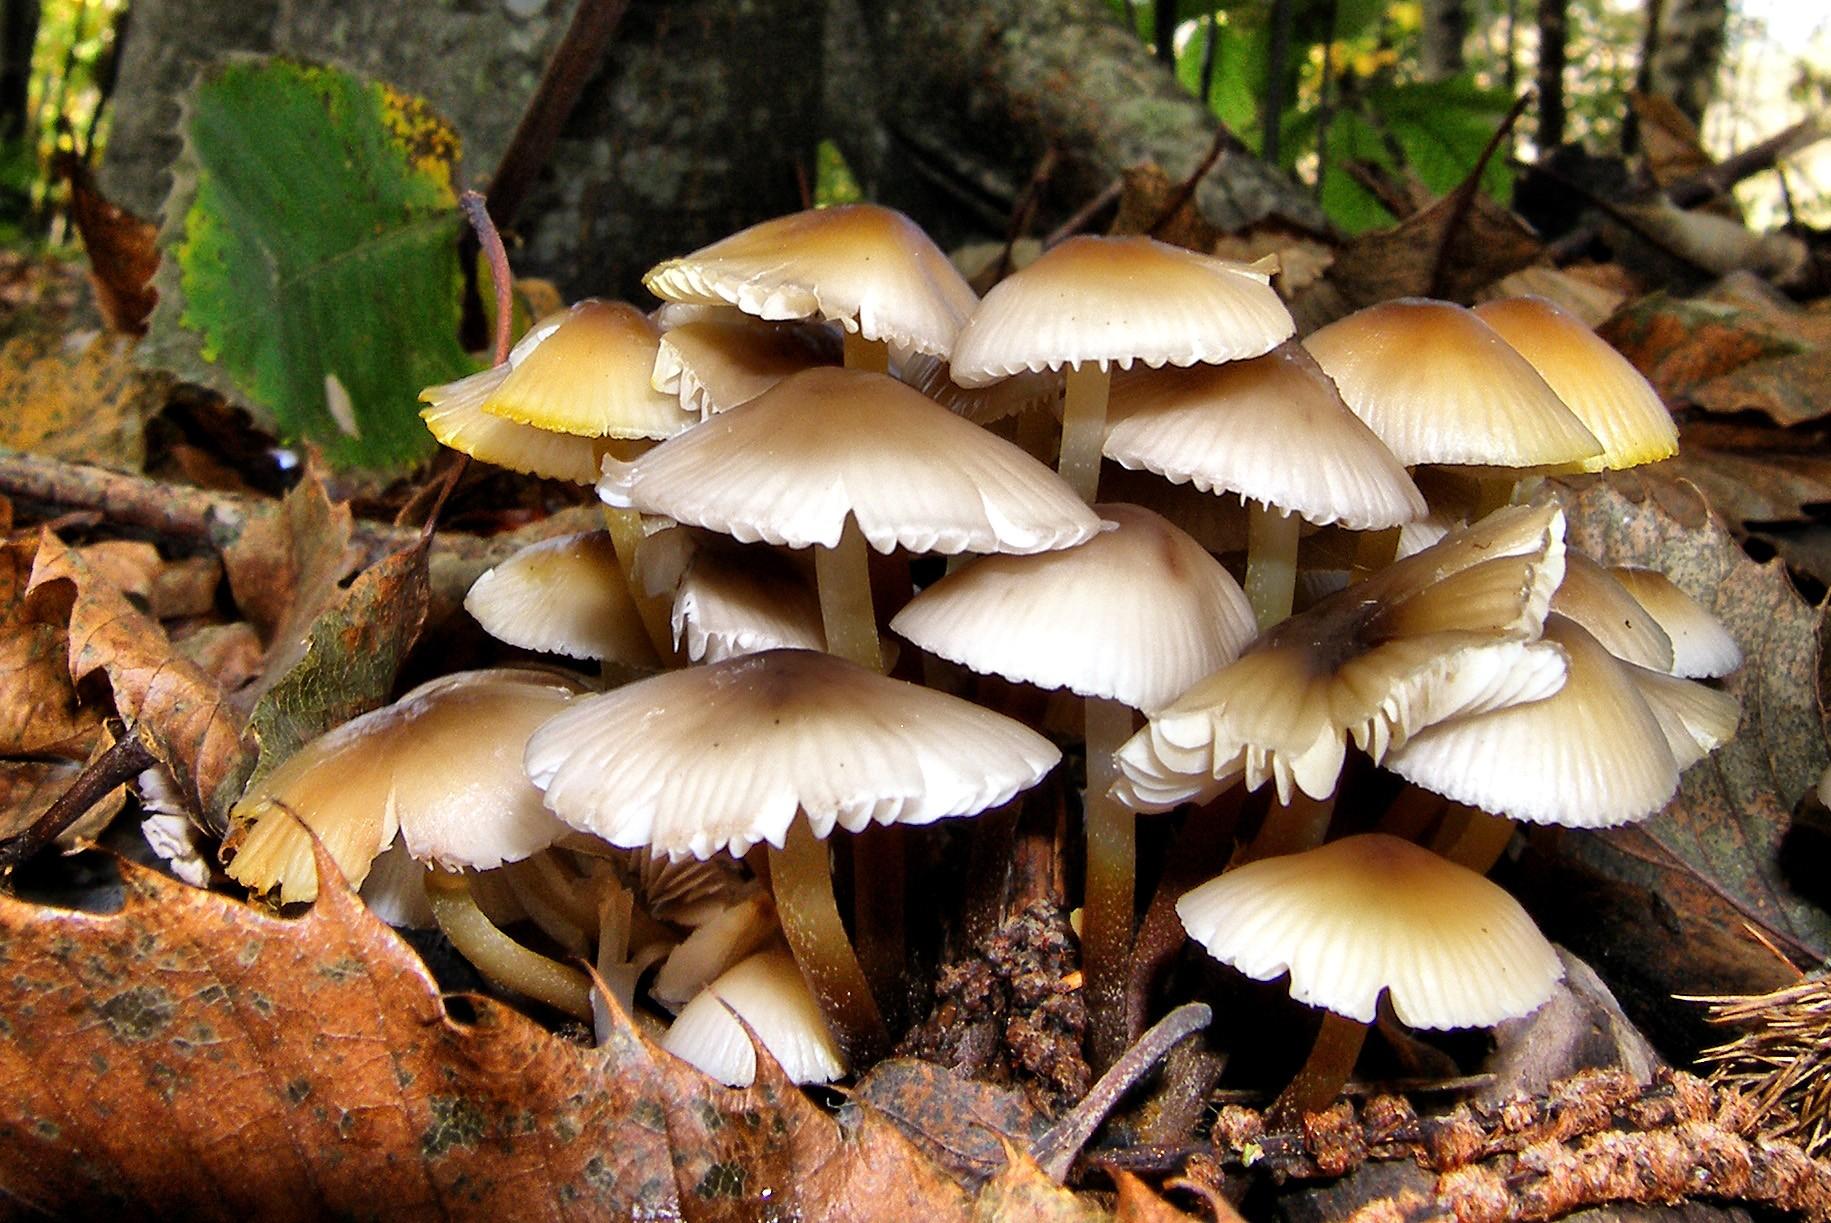 mushrooms_4b2c783421b2f_hires.jpg